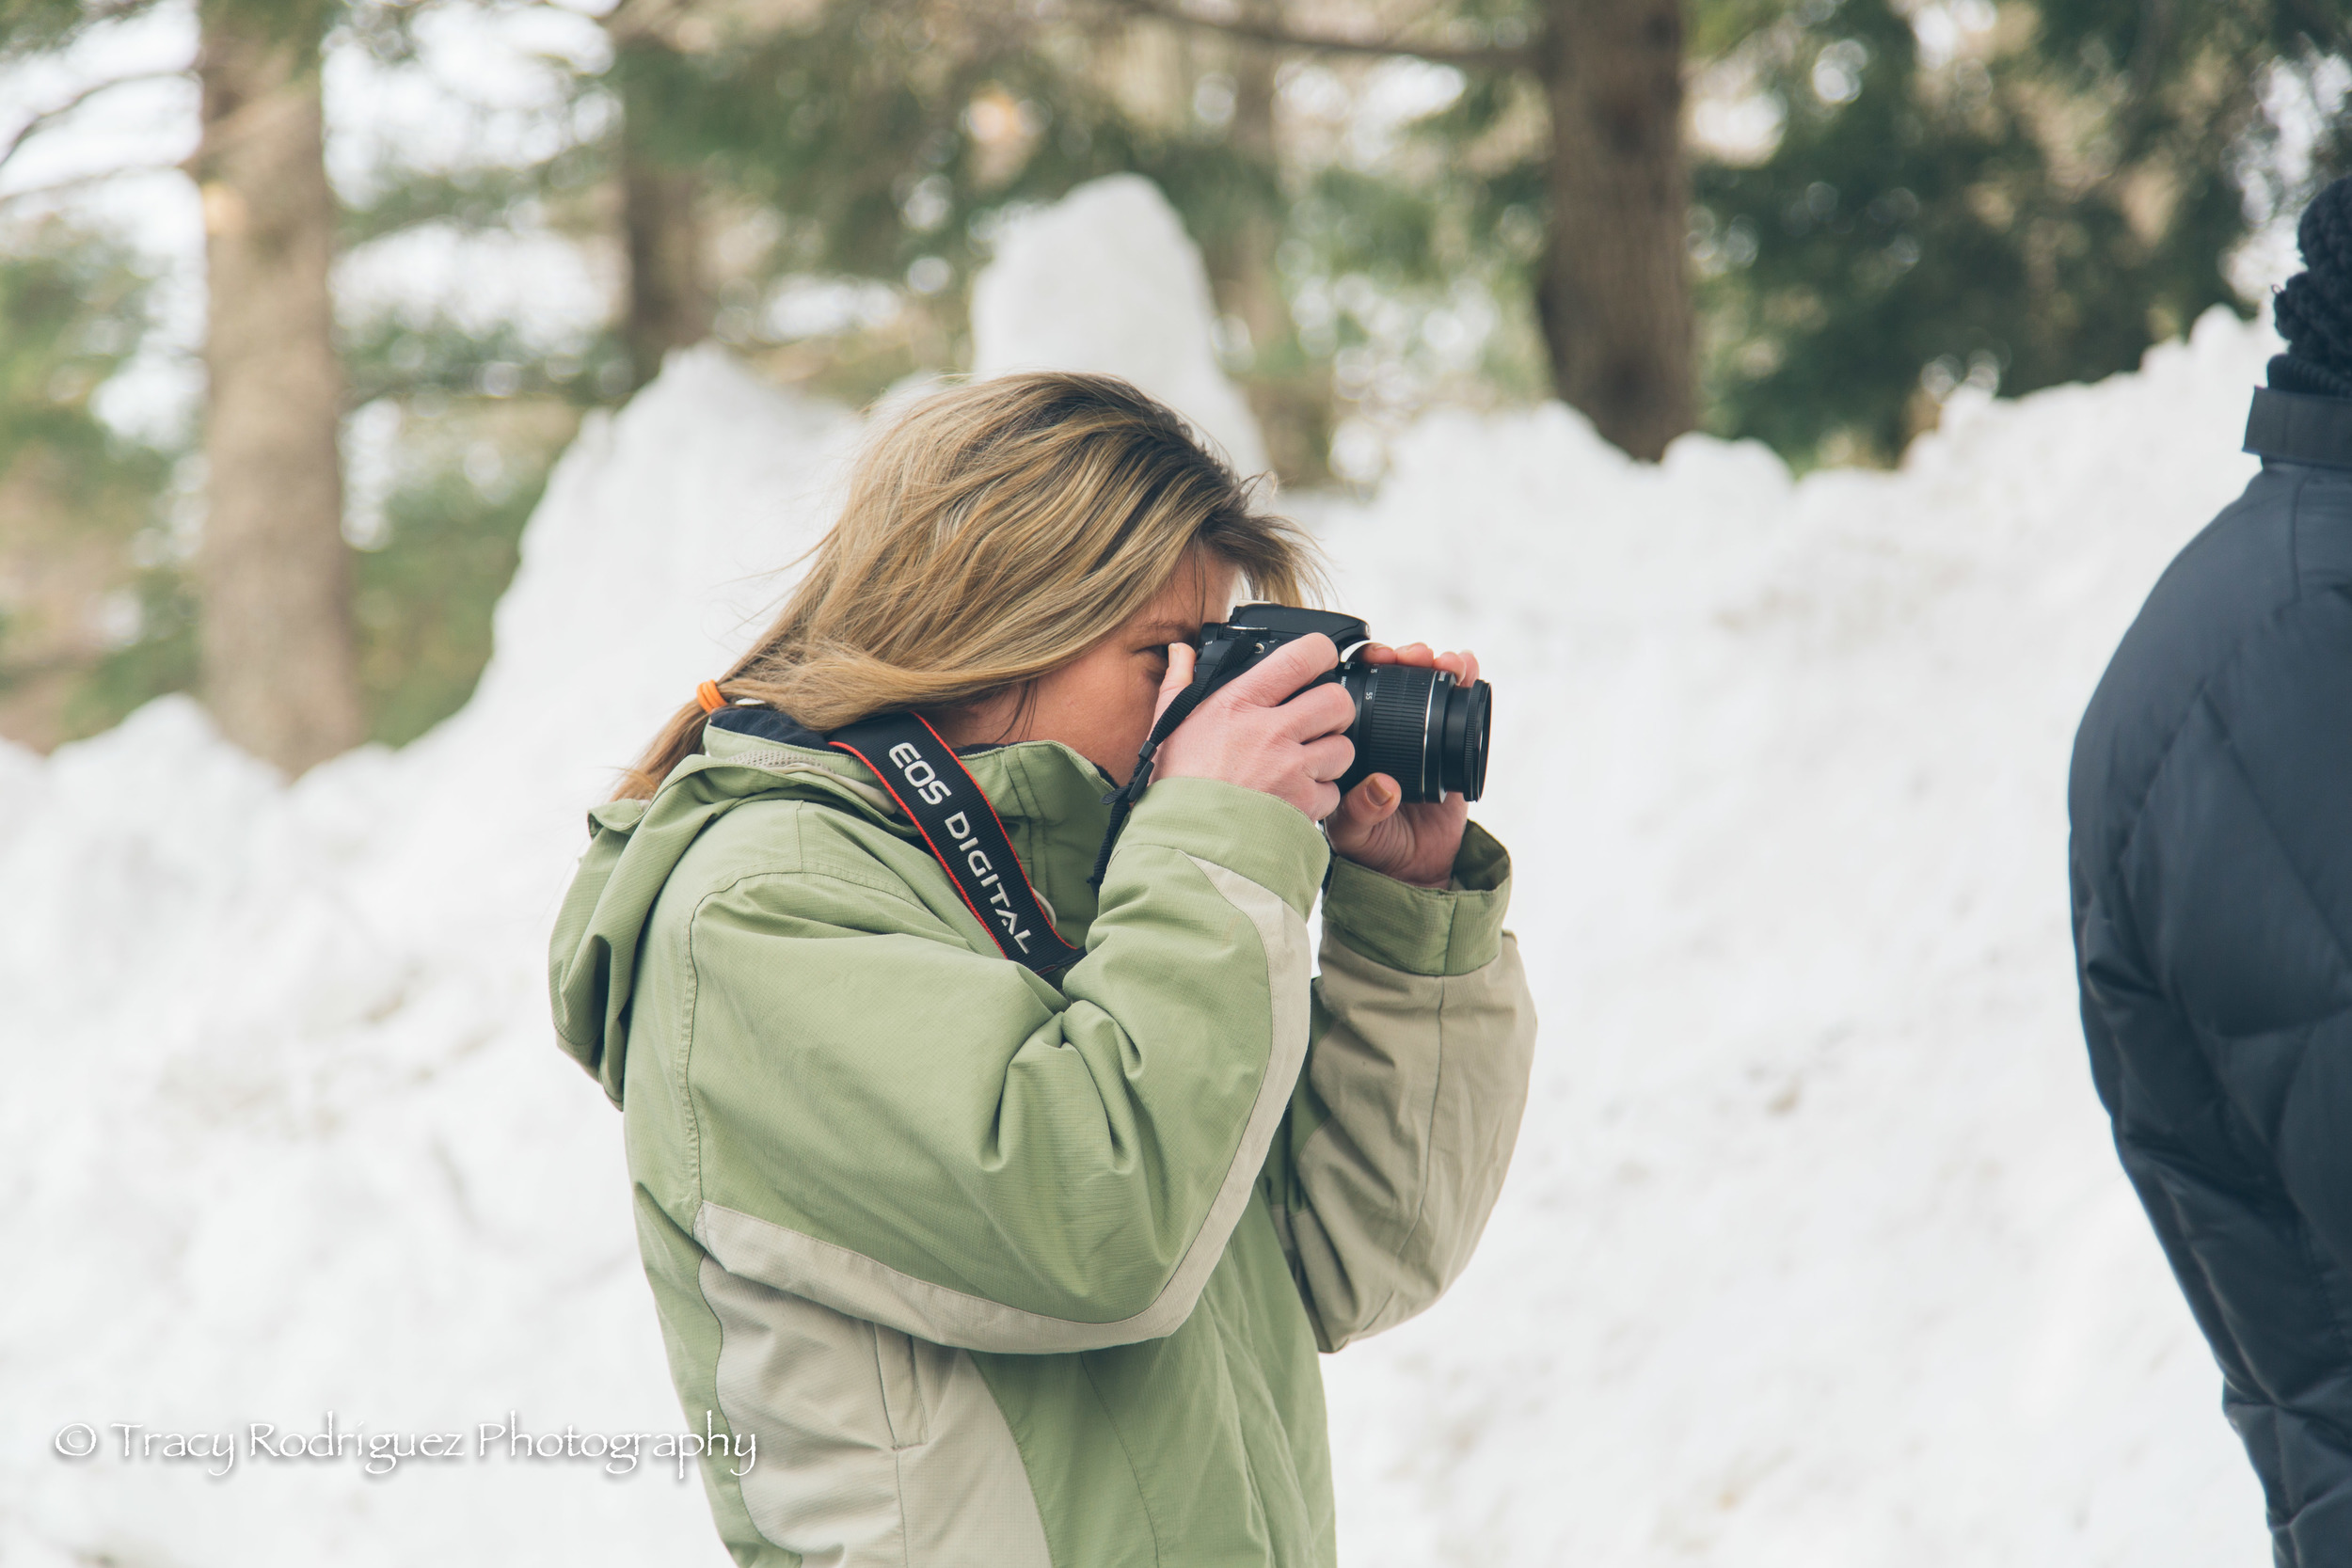 TracyRodriguezPhotography-2.jpg